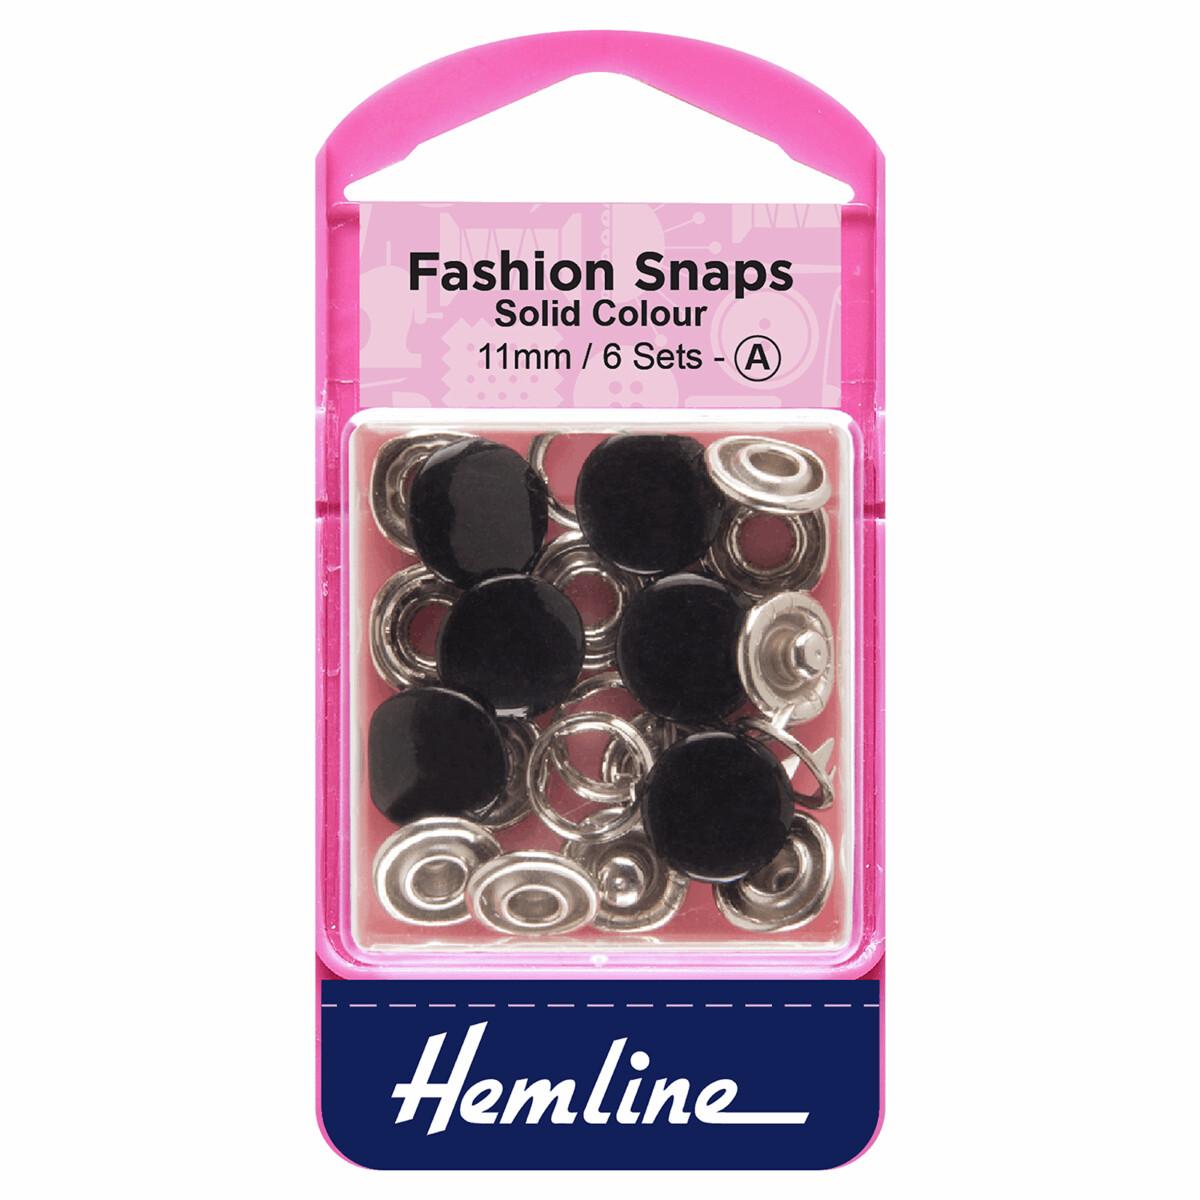 Fashion Snaps: Solid Top: 11mm: Black : 6 Sets